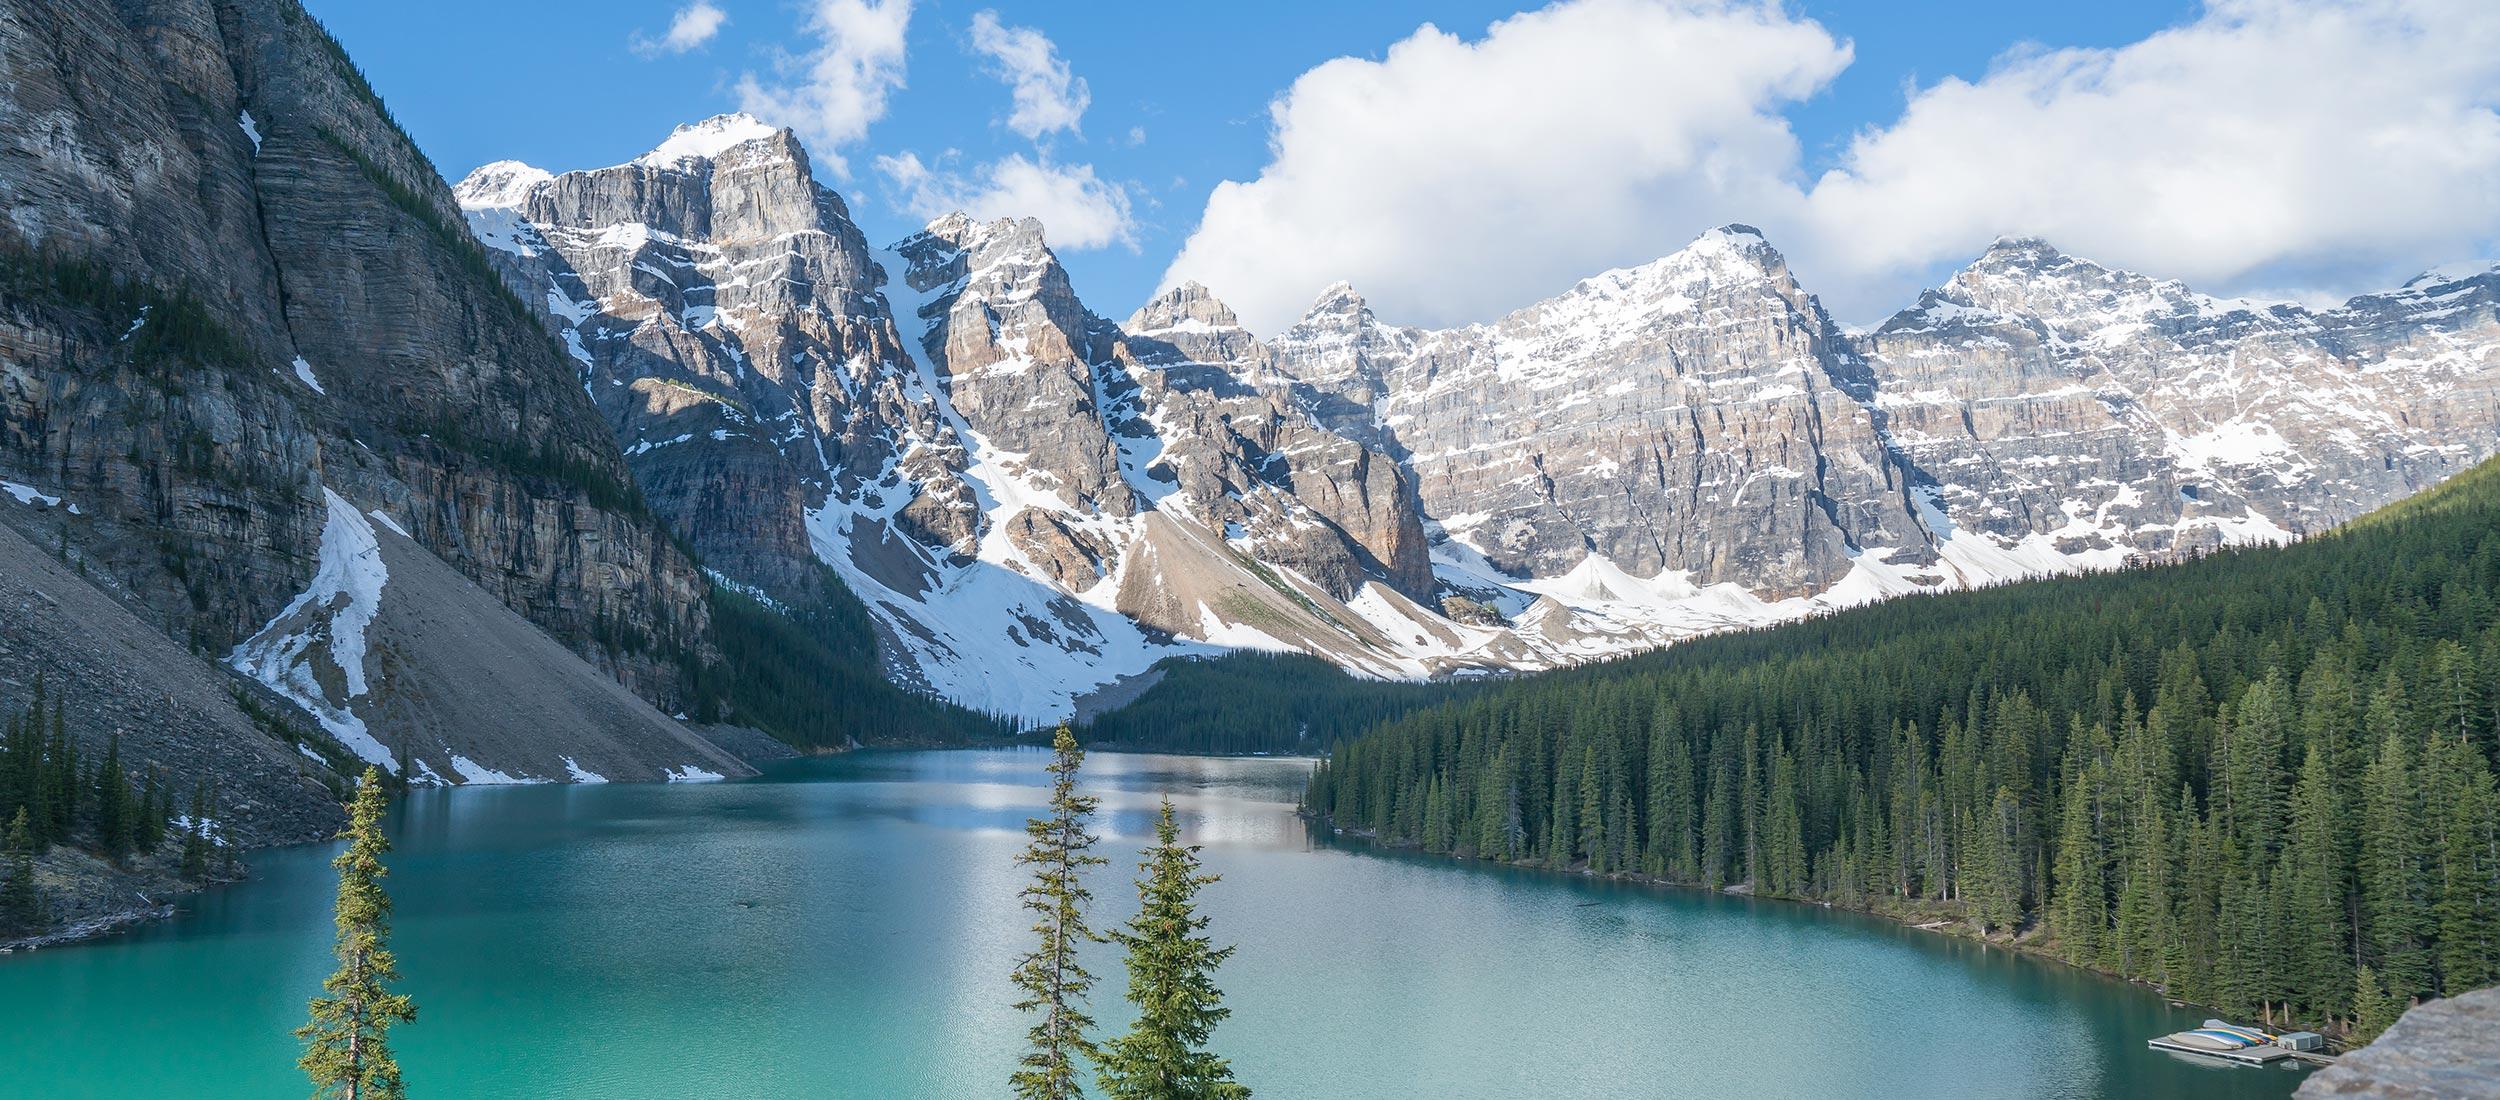 Kanada Berge See